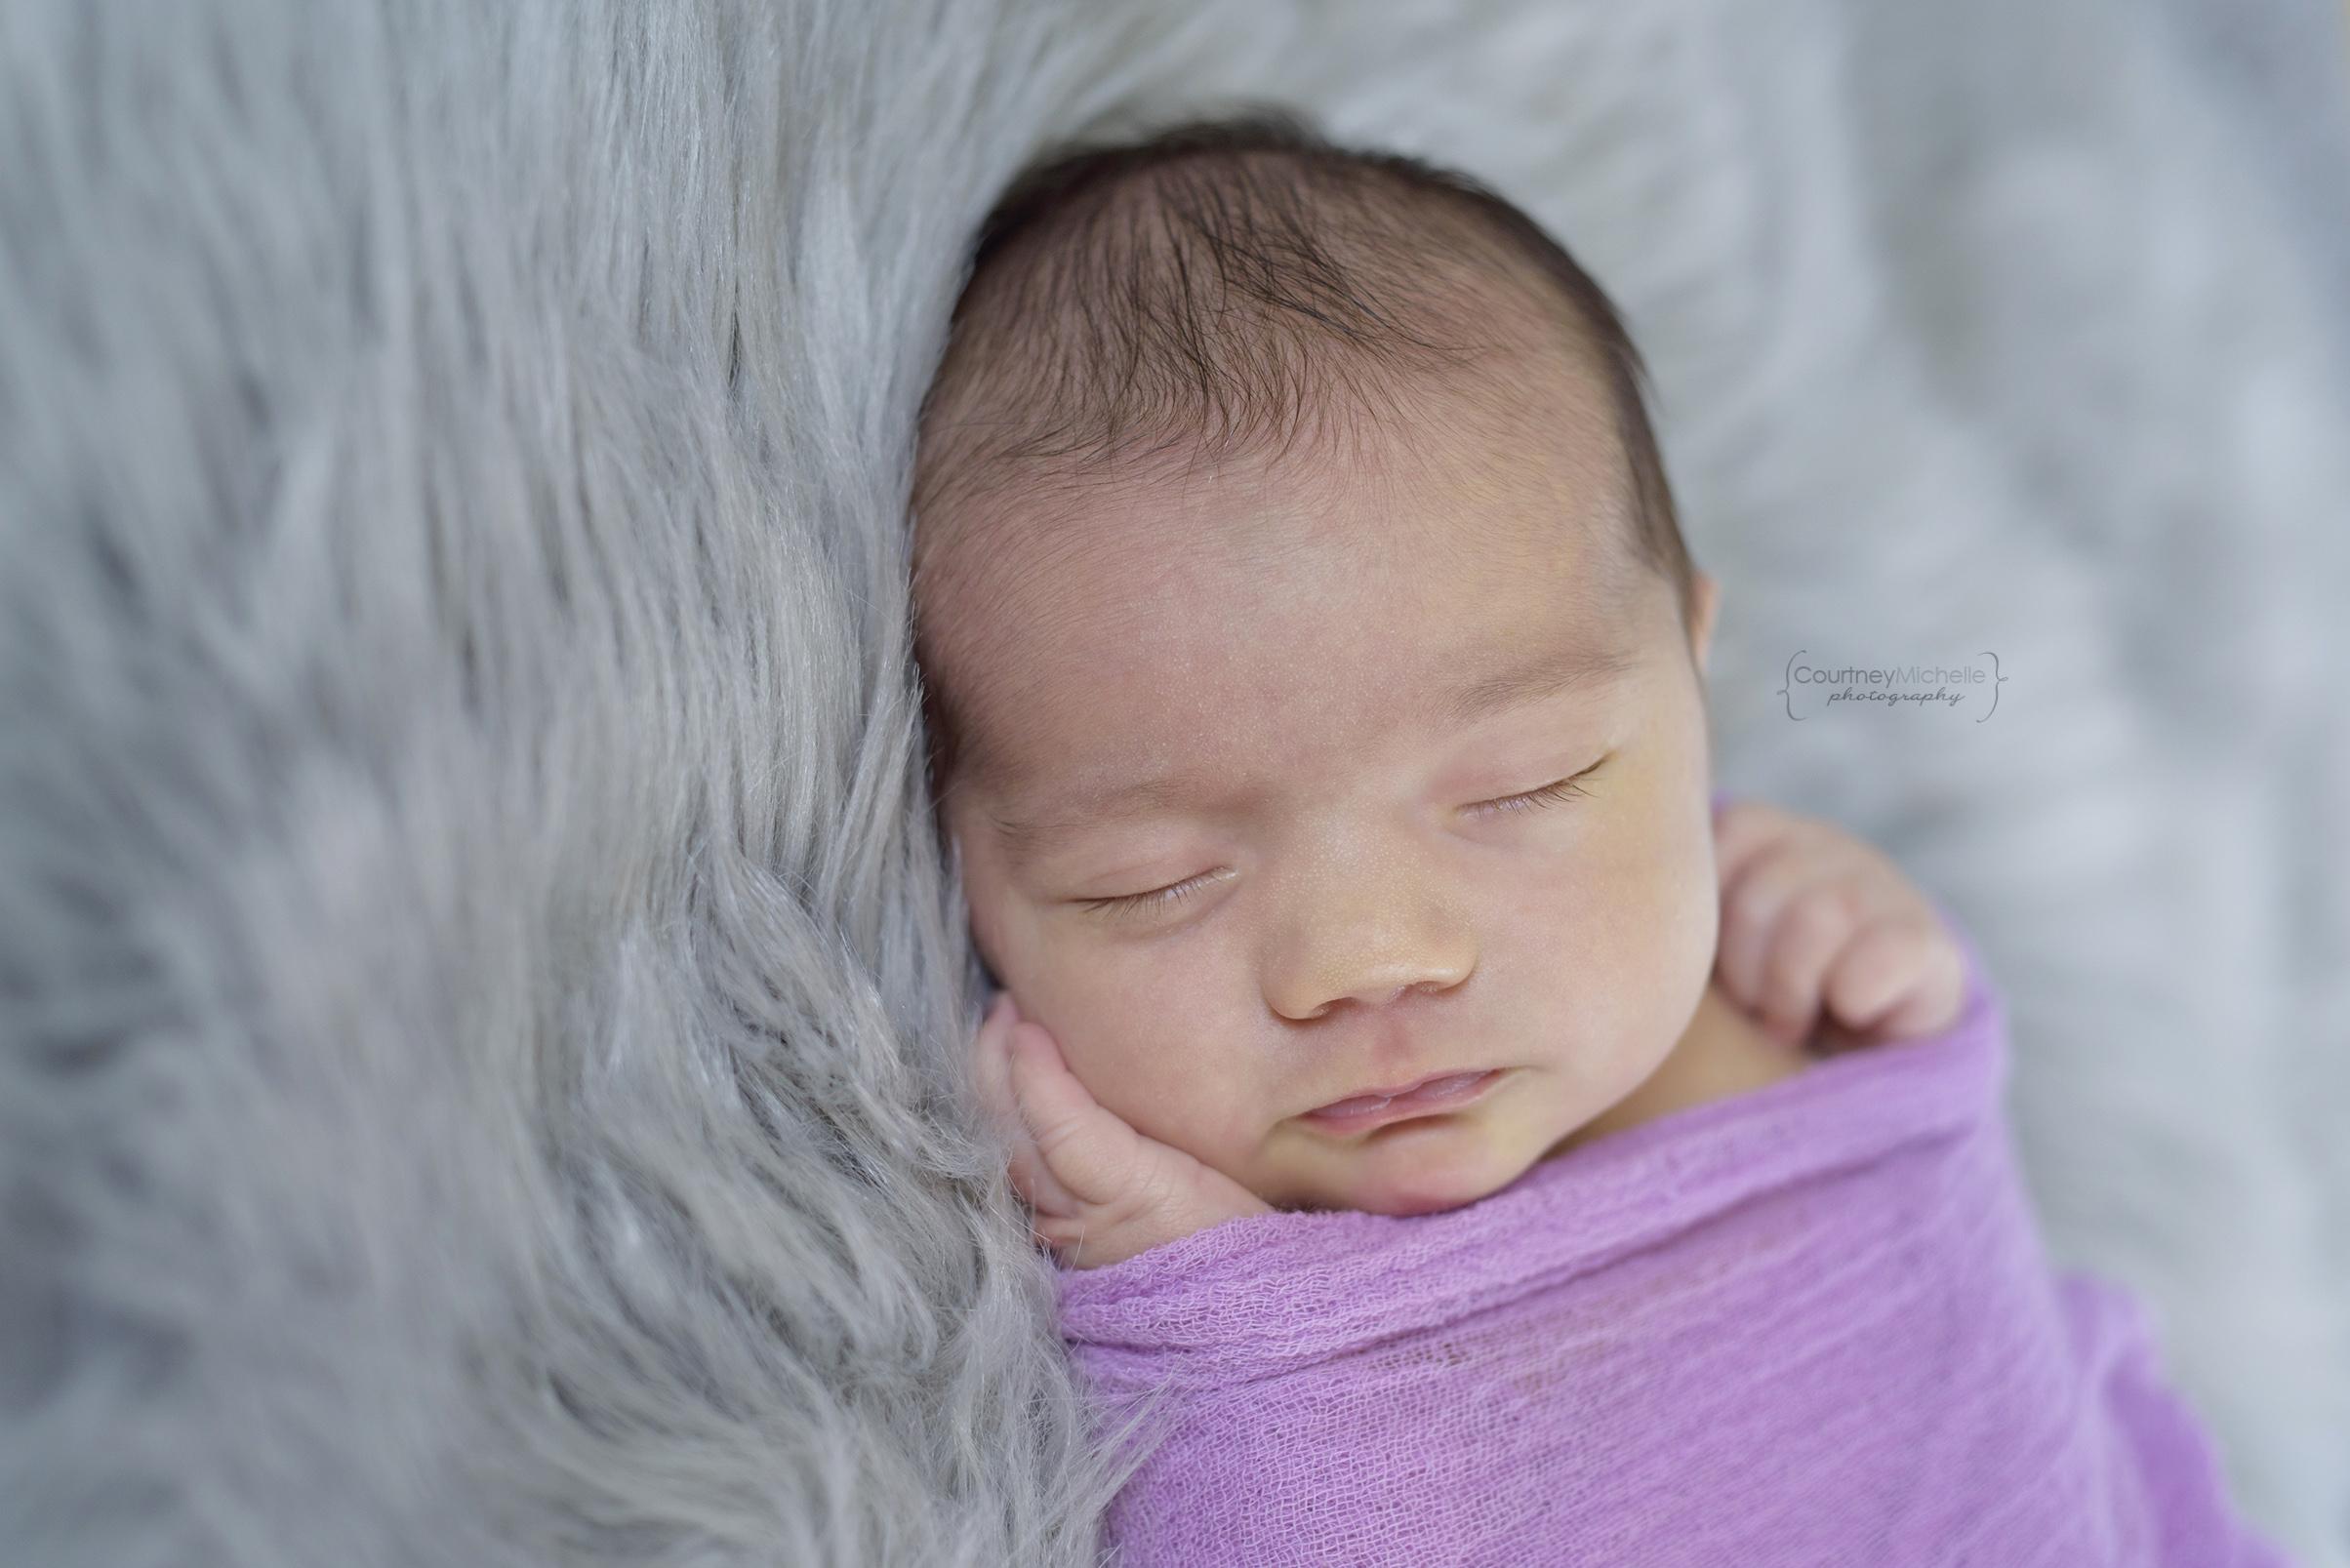 chicago-newborn-photographer-courtney-laper-lifestyle-©COPYRIGHTCMP-edit-1989.jpg